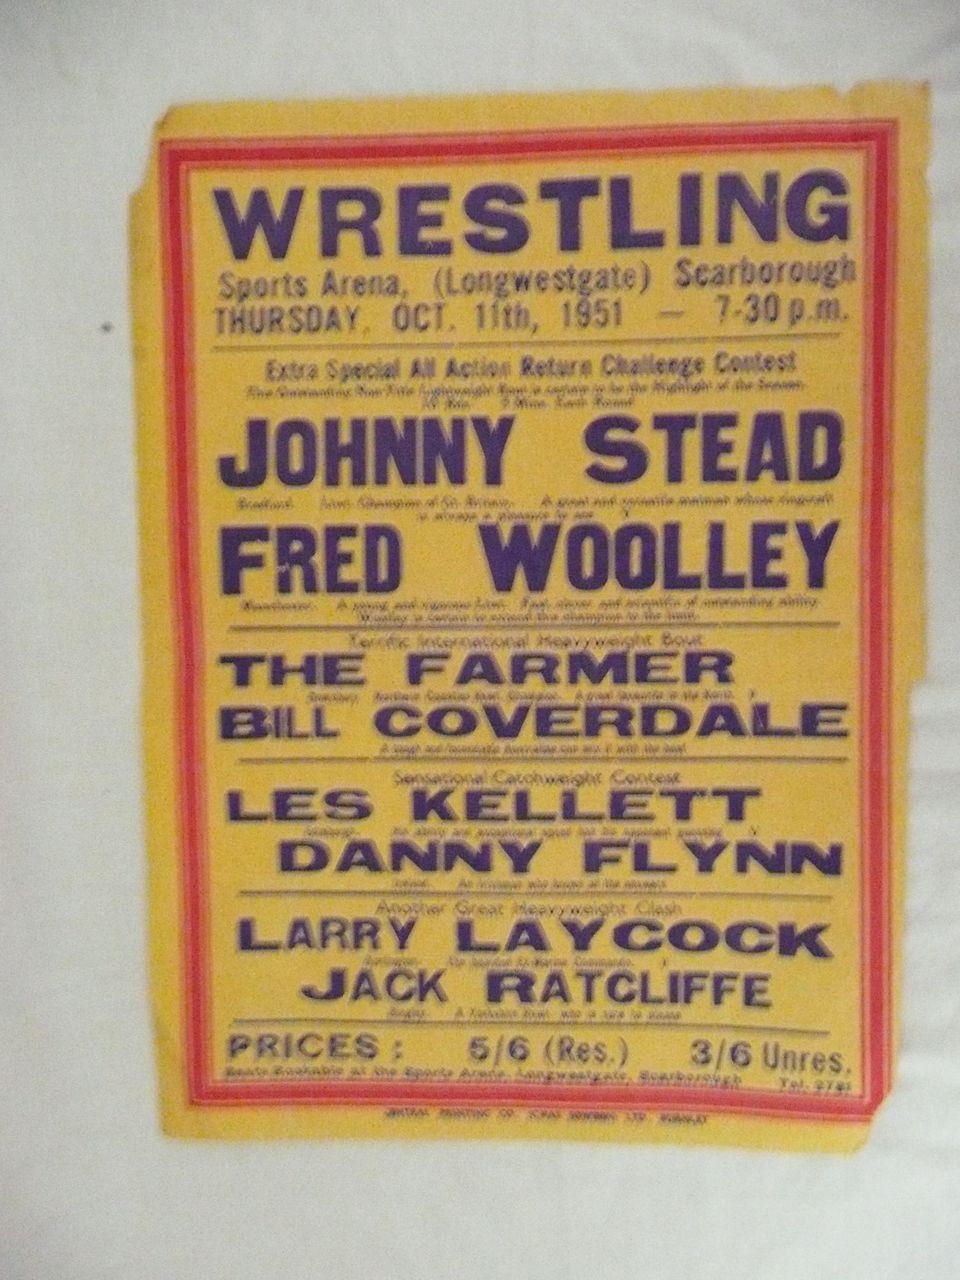 WRESTLING  - Genuine Old 1950 Advertising Poster - Scarborough England